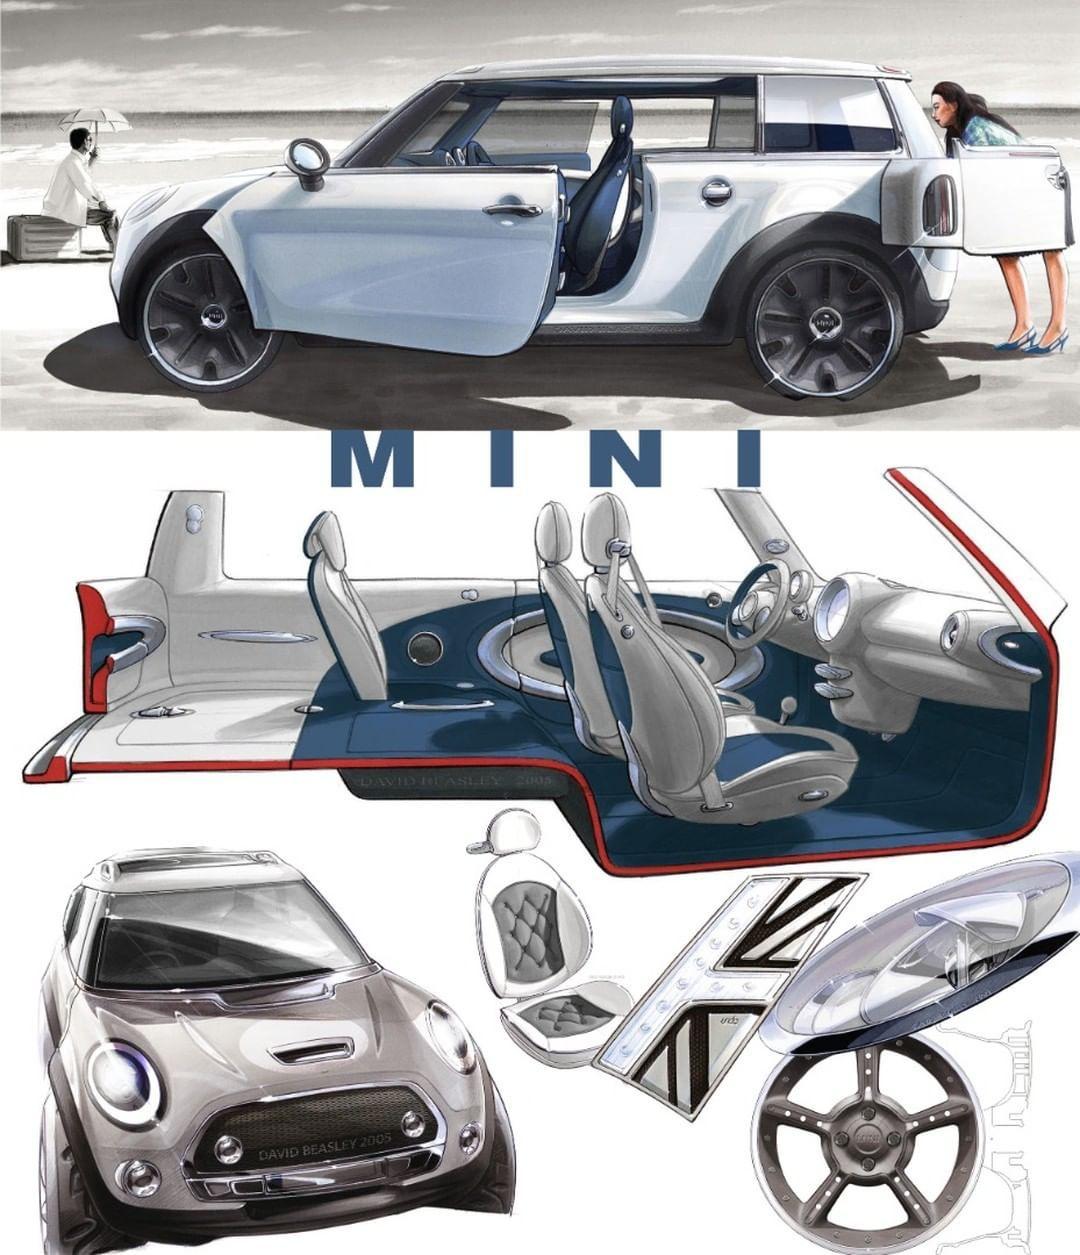 "David Malcolm Beasley on Instagram: ""Back in the day.... Mini Clubman Concept, 2005/6. #minidesign #mini #clubman #miniclubman #miniconcept #formtrends #cardesignnews…"""